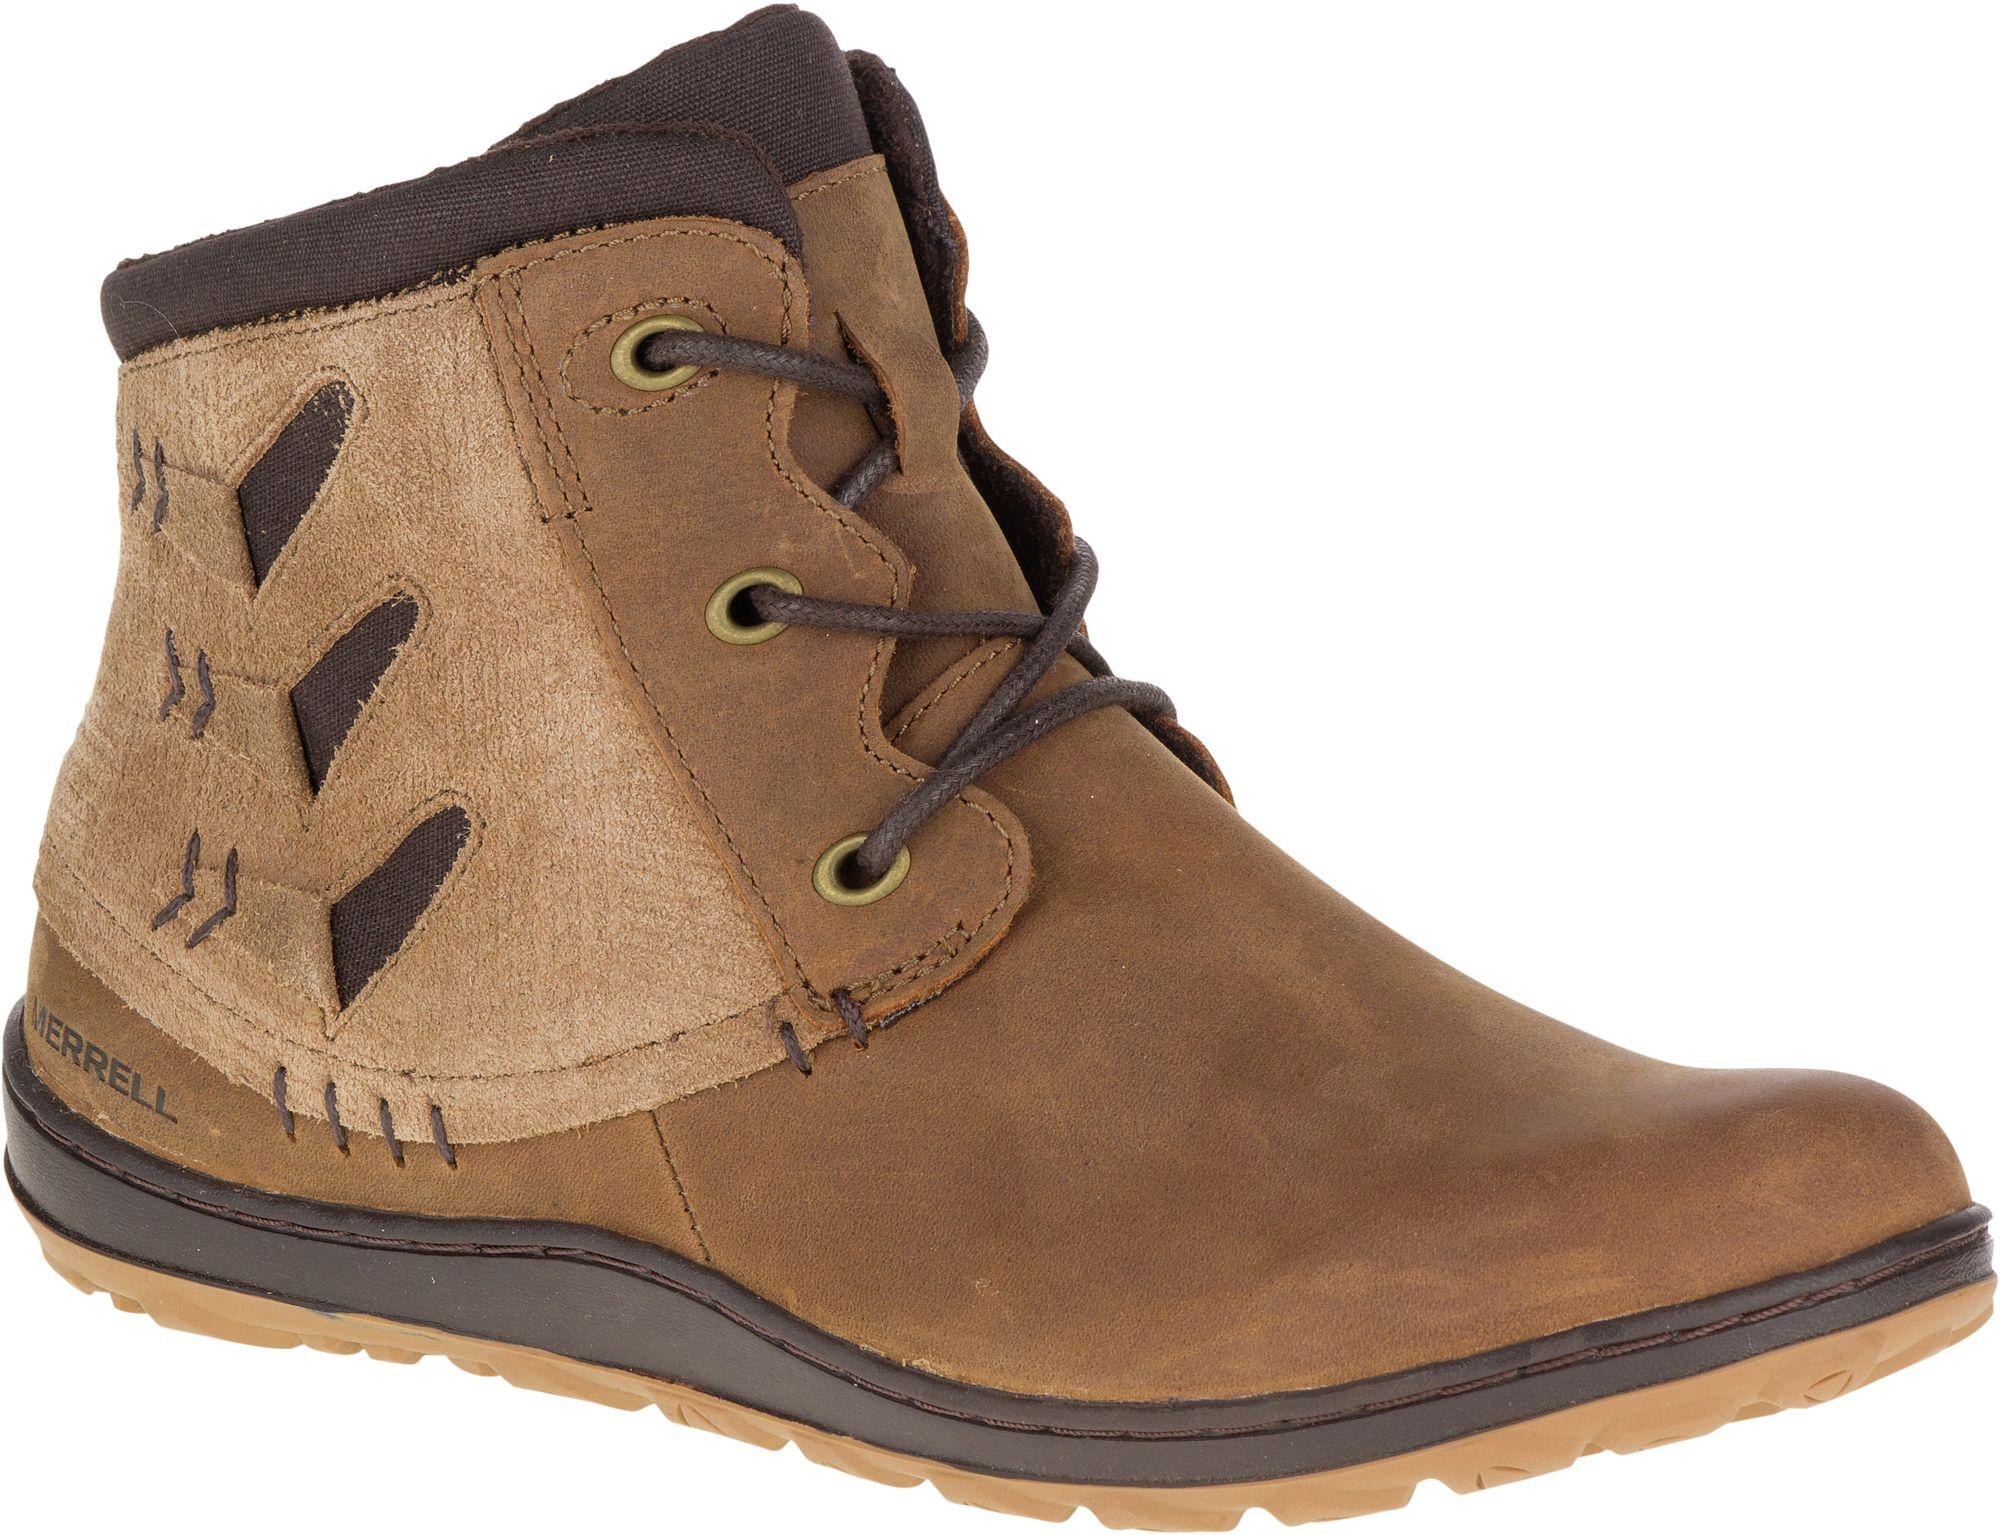 Women's Ashland Vee Waterproof Ankle Boots  DICK'S Sporting Goods